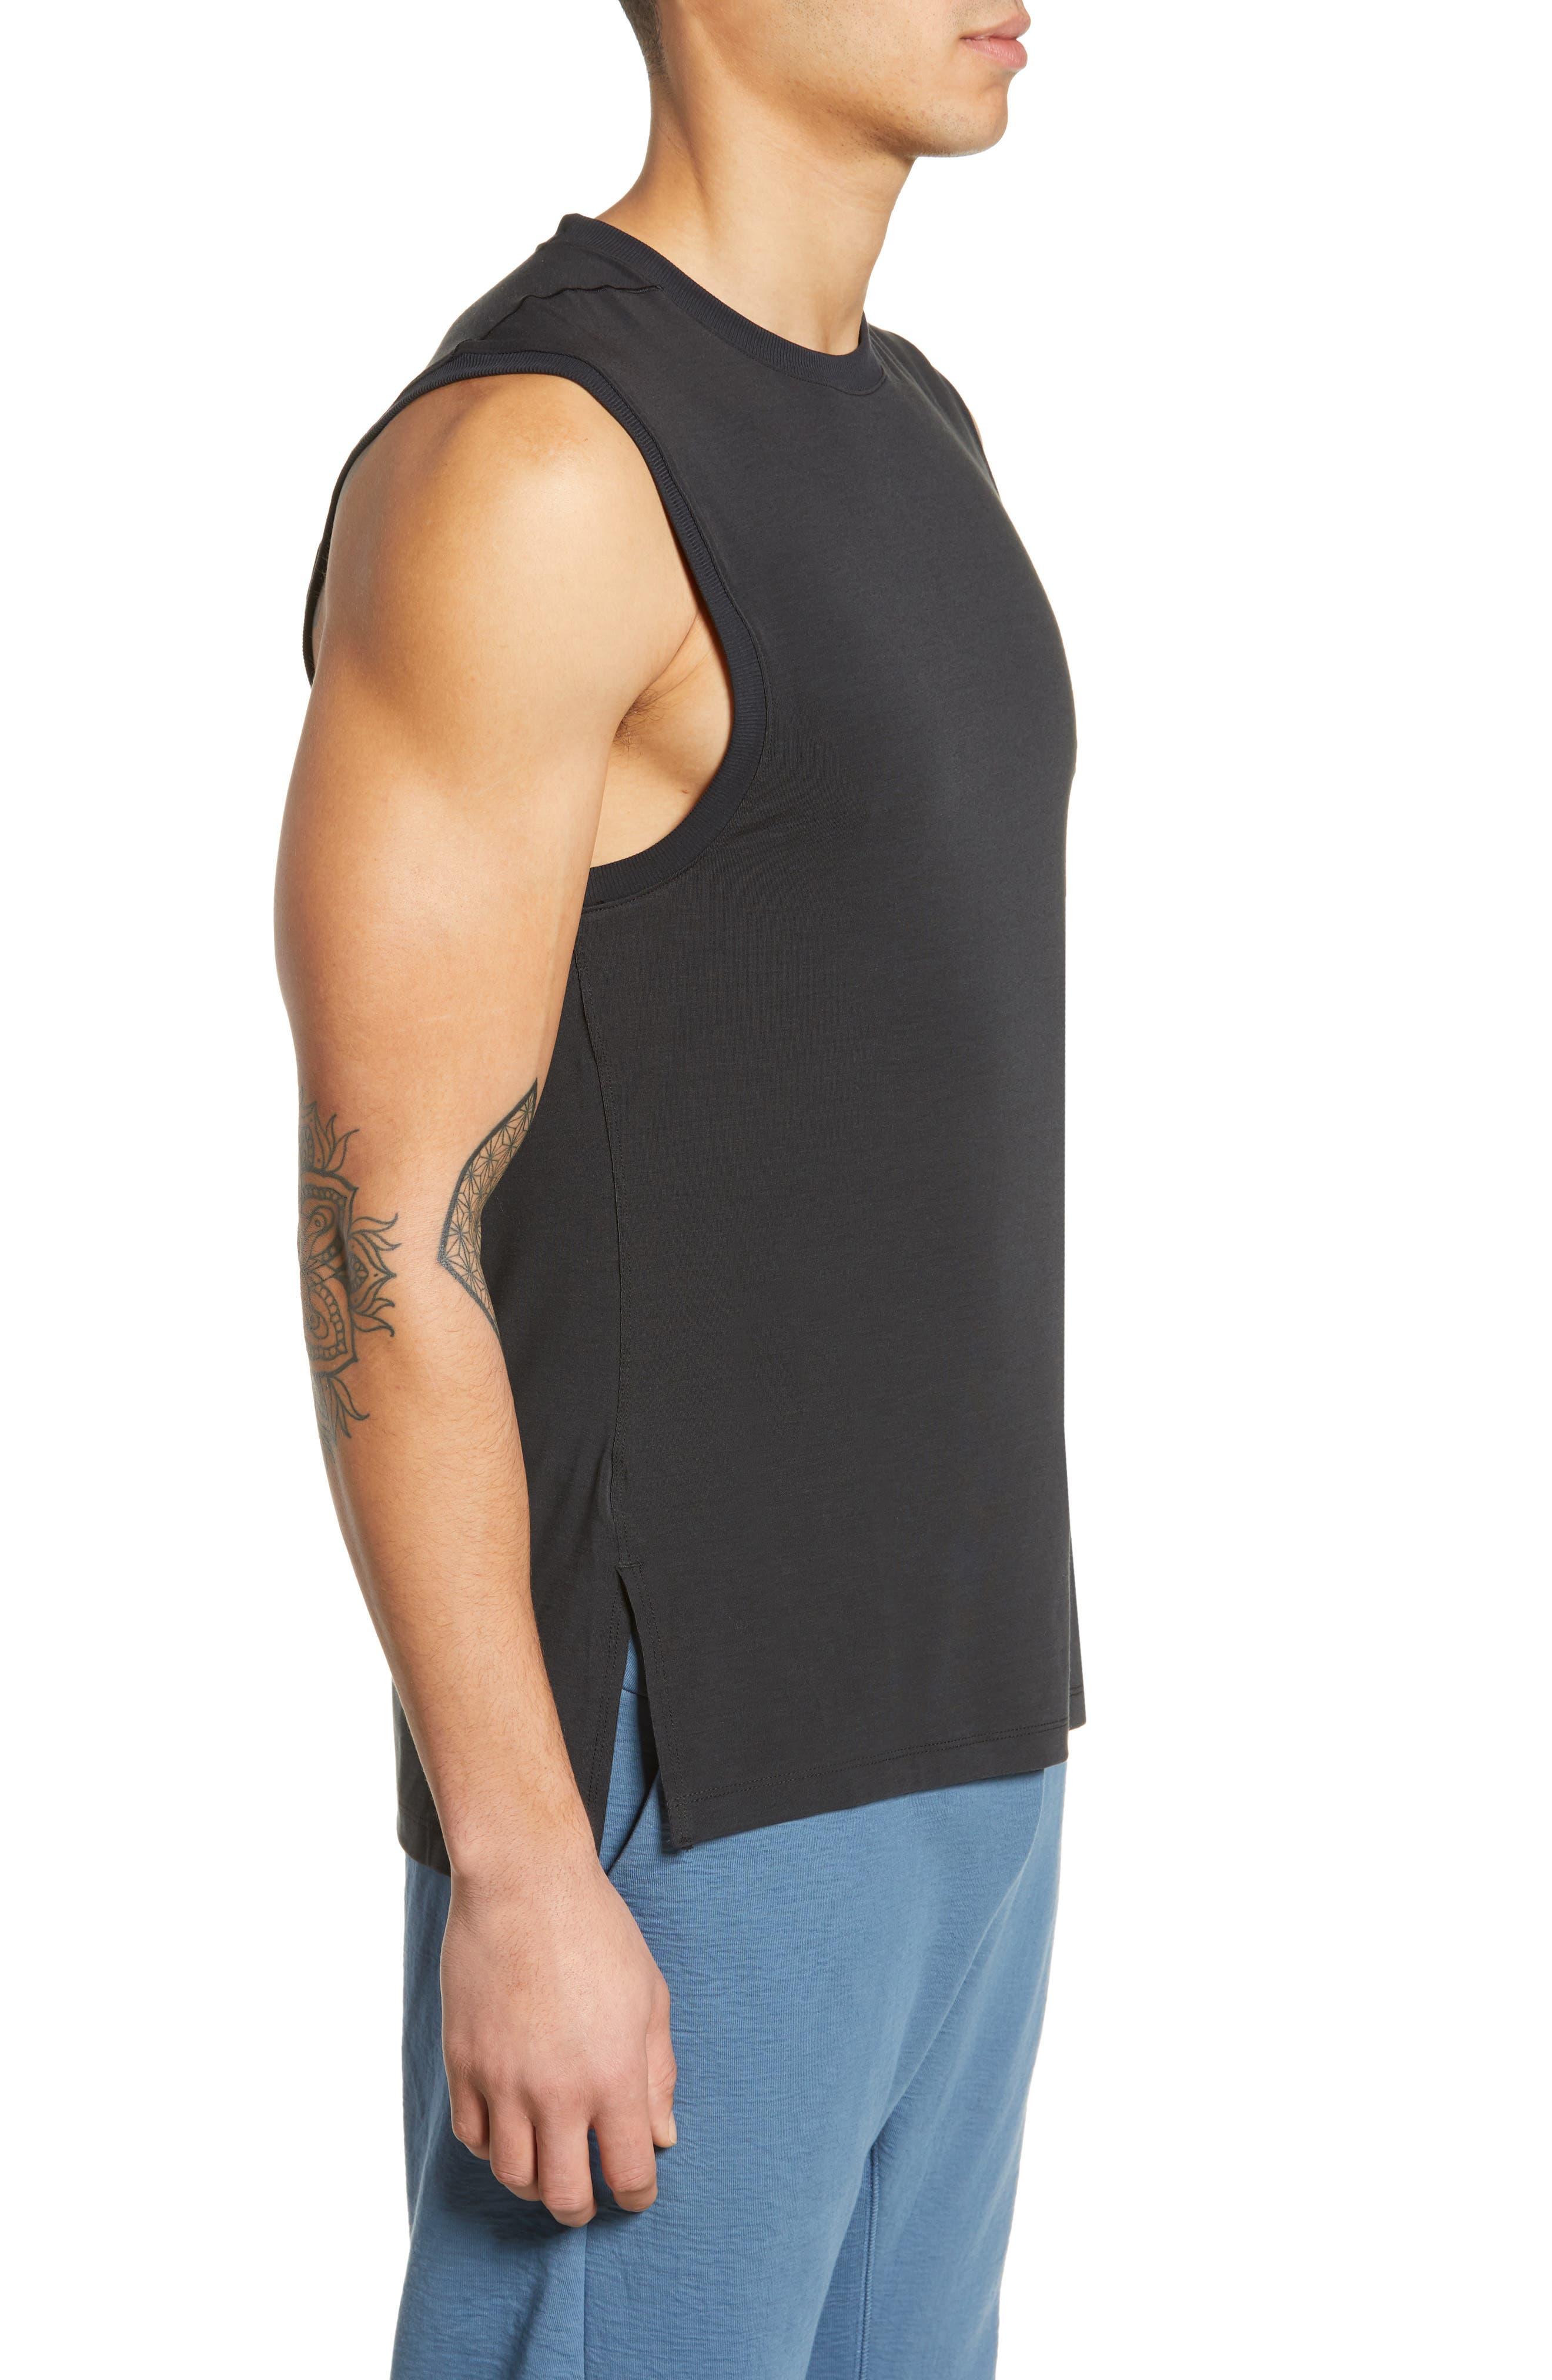 NIKE, Dry Transcent Sleeveless T-Shirt, Alternate thumbnail 3, color, BLACK/ DARK GREY